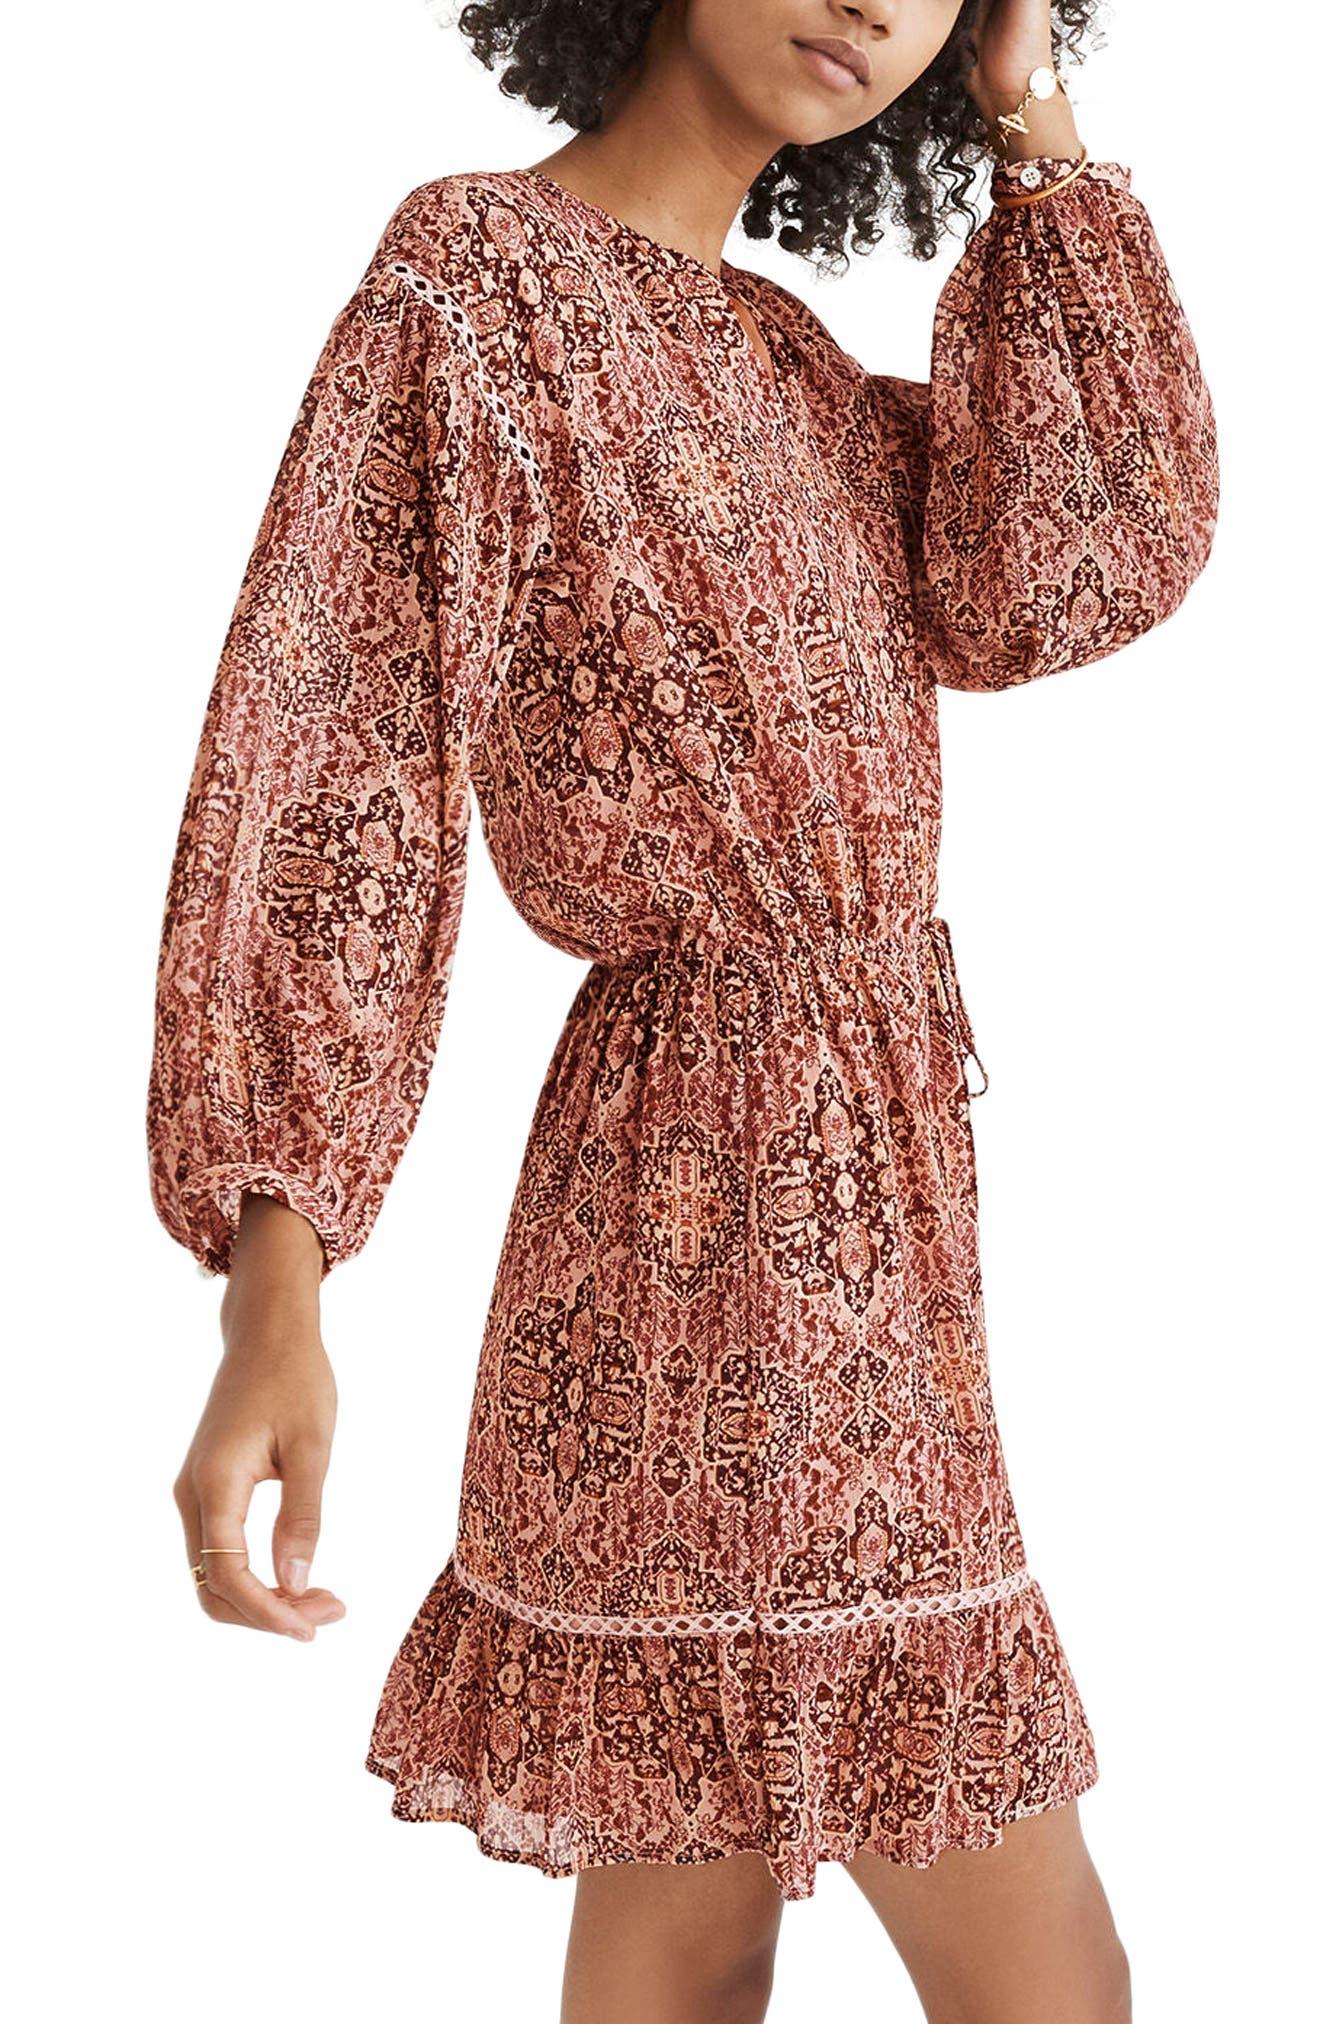 Alternate Image 1 Selected - Madewell Drawstring Peasant Dress